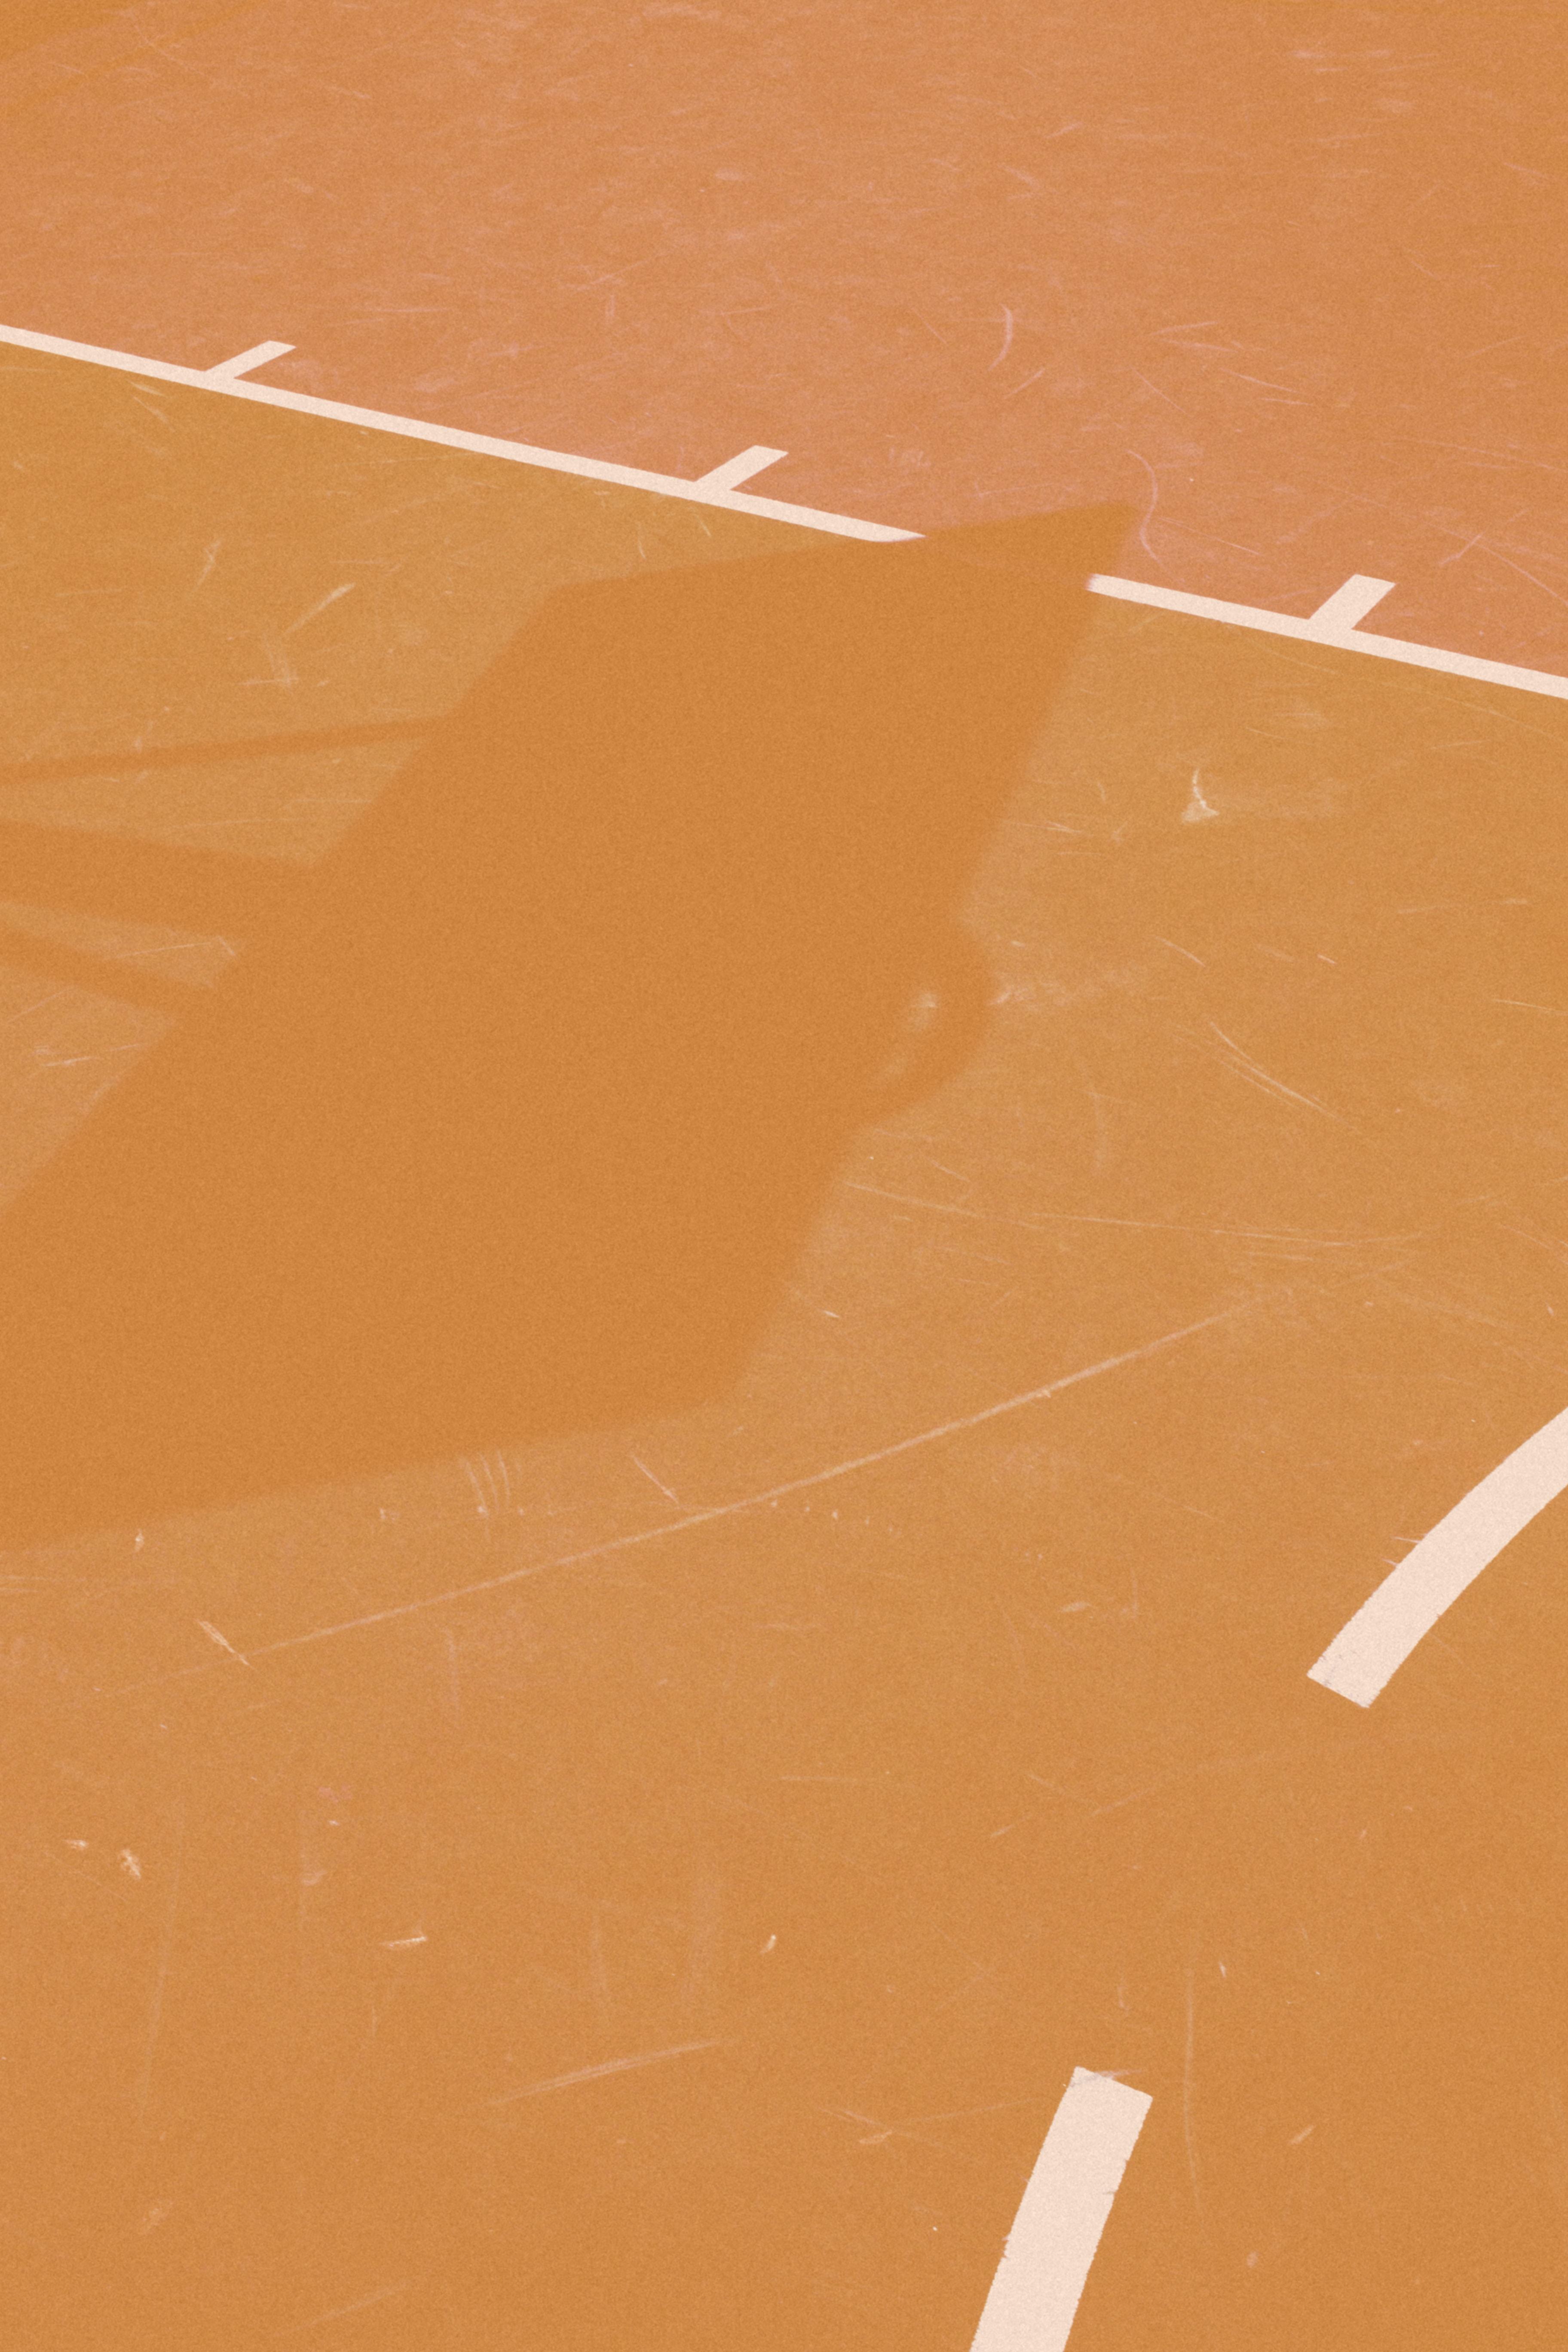 basketball hoop casting shadow on line